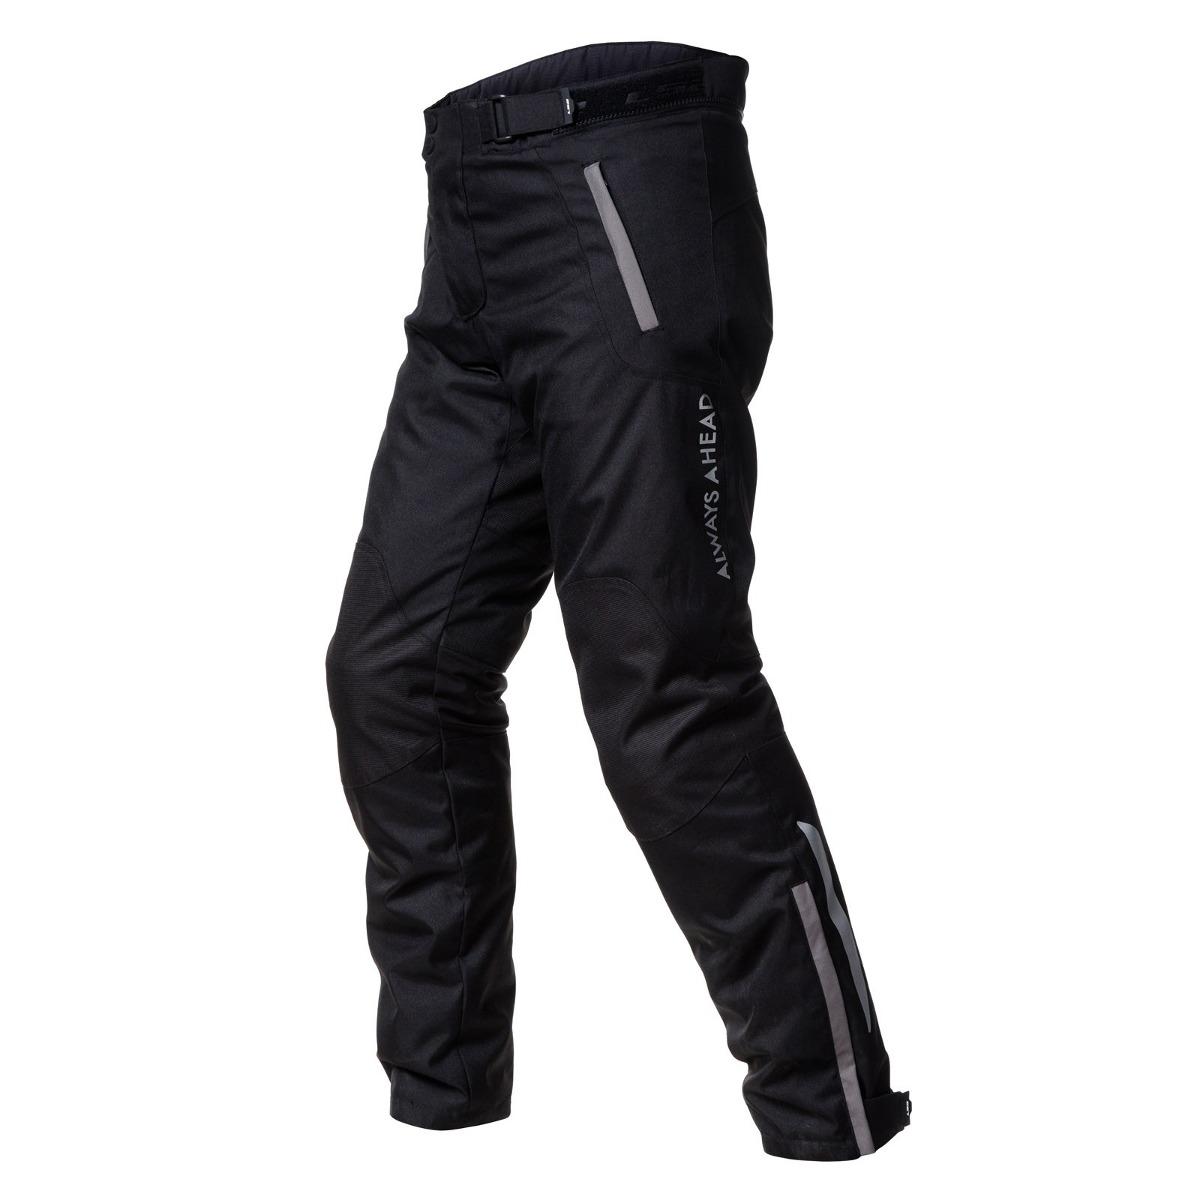 pantalon ls2 chart negro hombre talle m